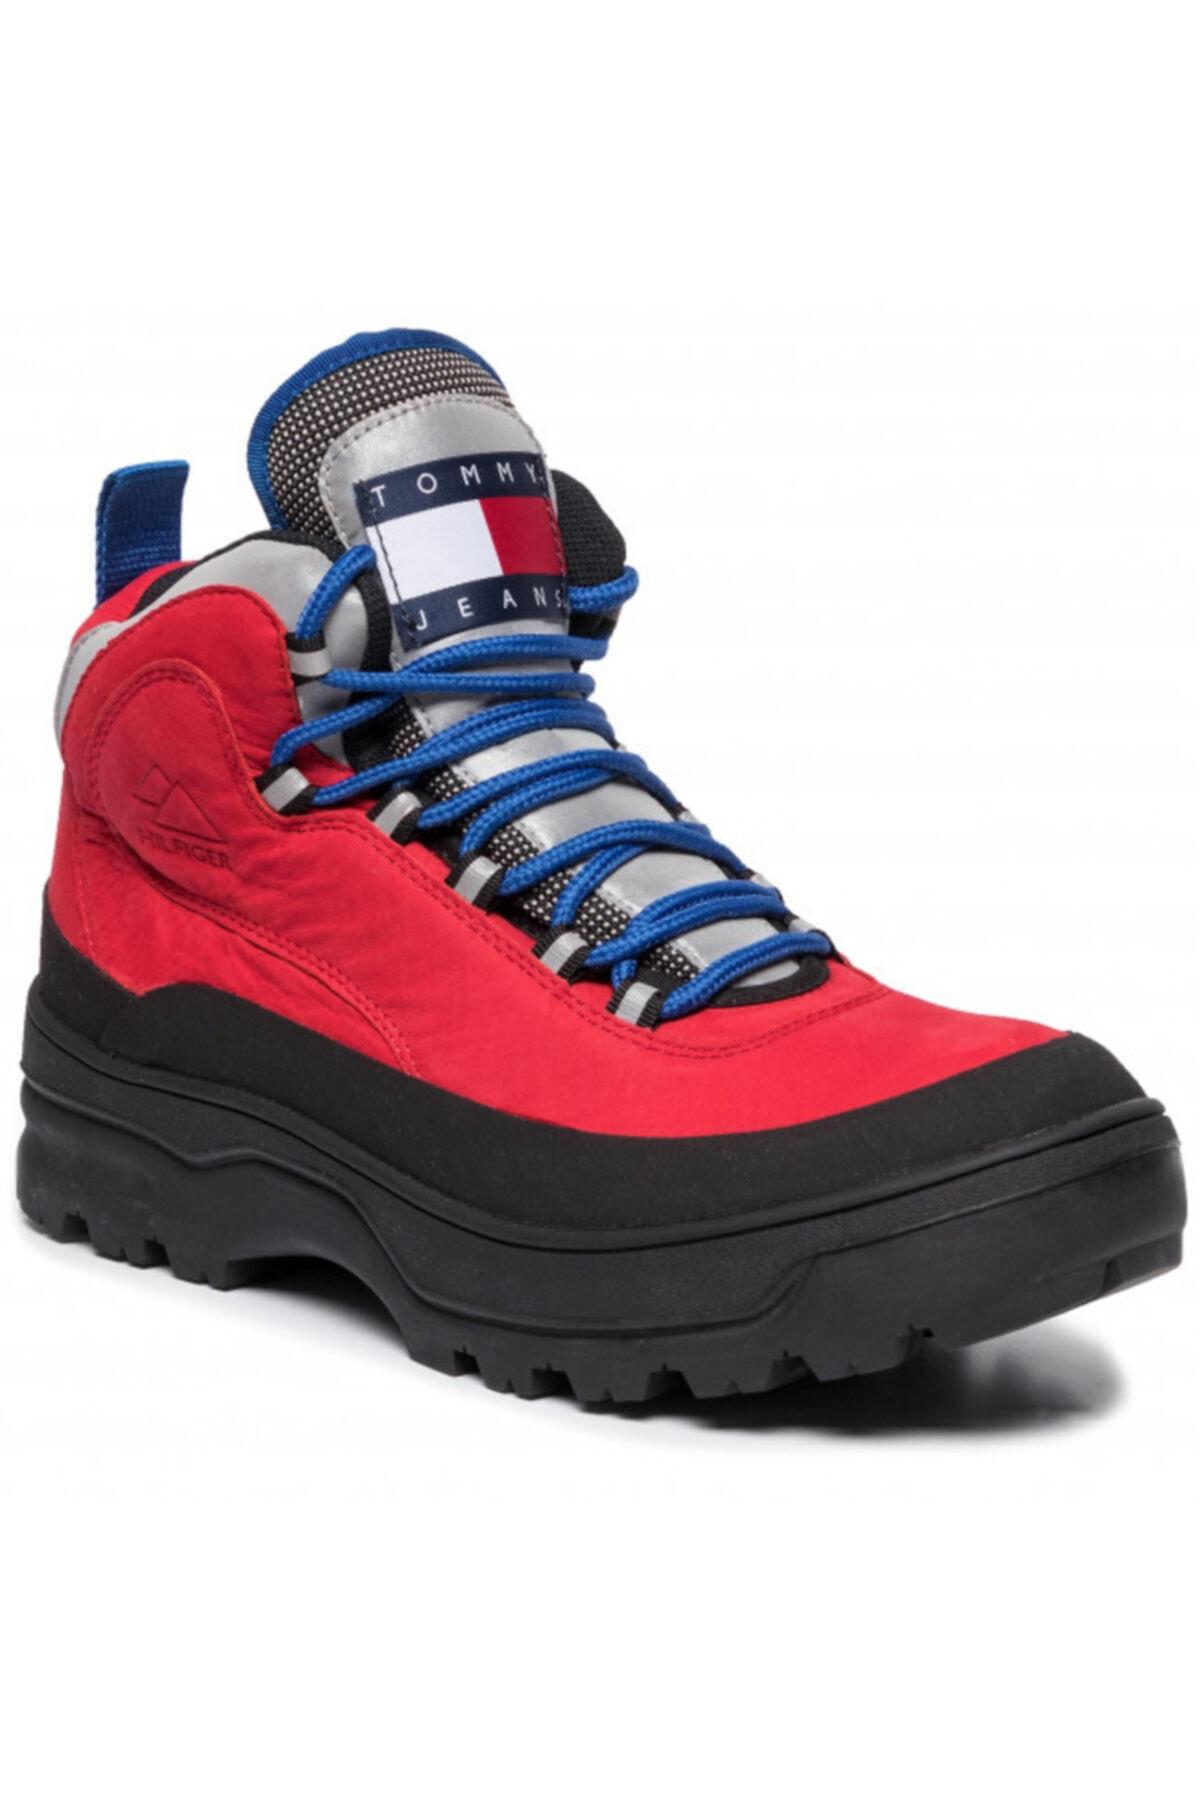 Hilfiger Expedition Mens Boot